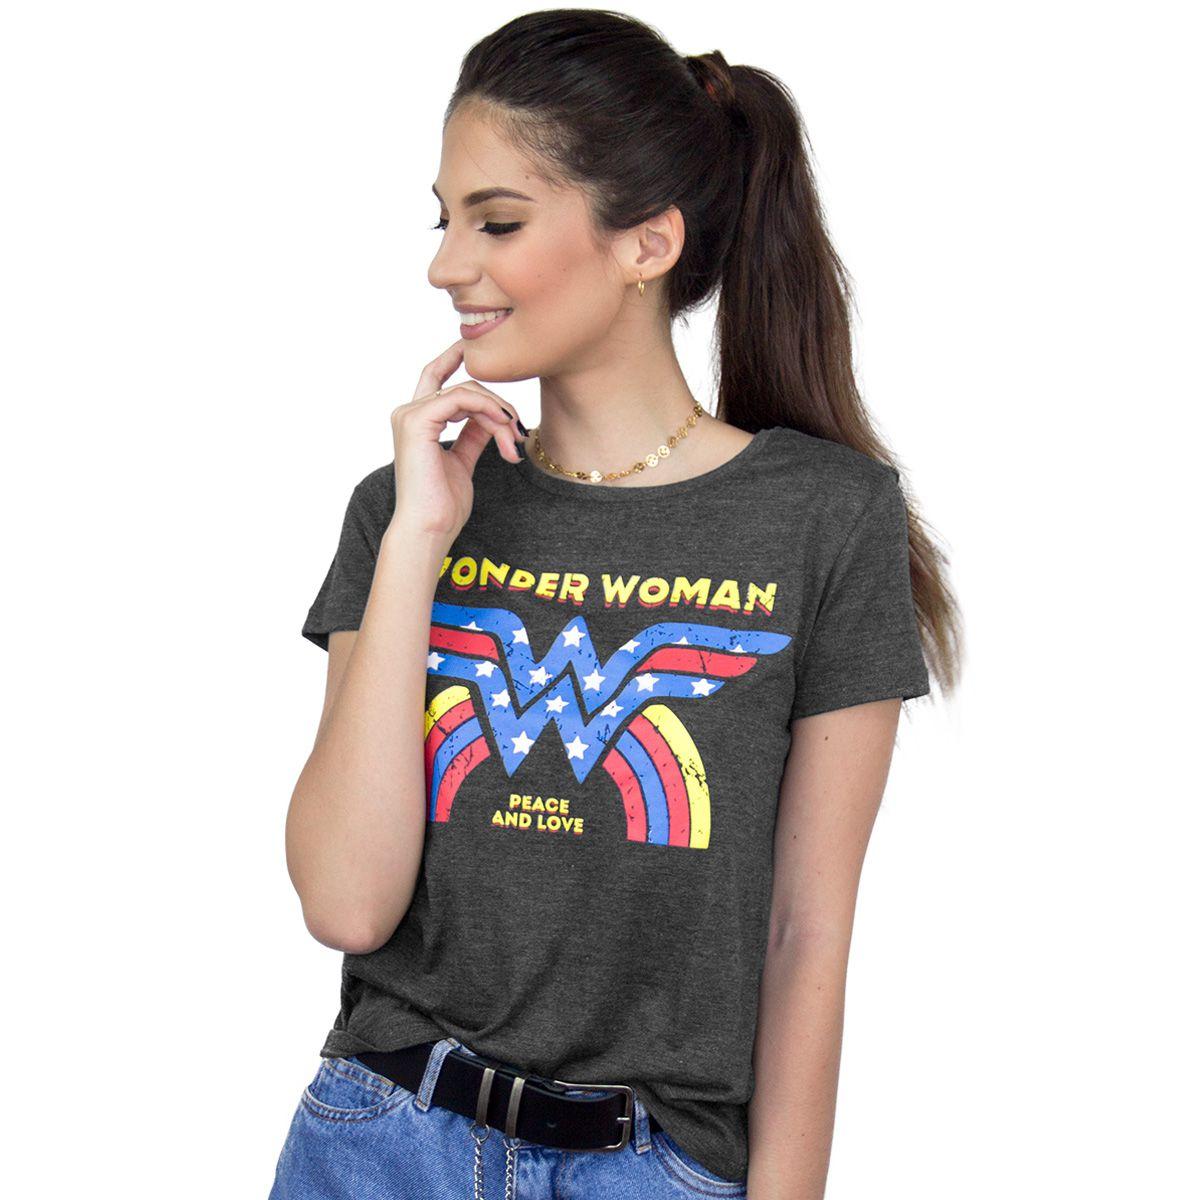 Camiseta Feminina Wonder Woman Peace and Love  - bandUP Store Marketplace